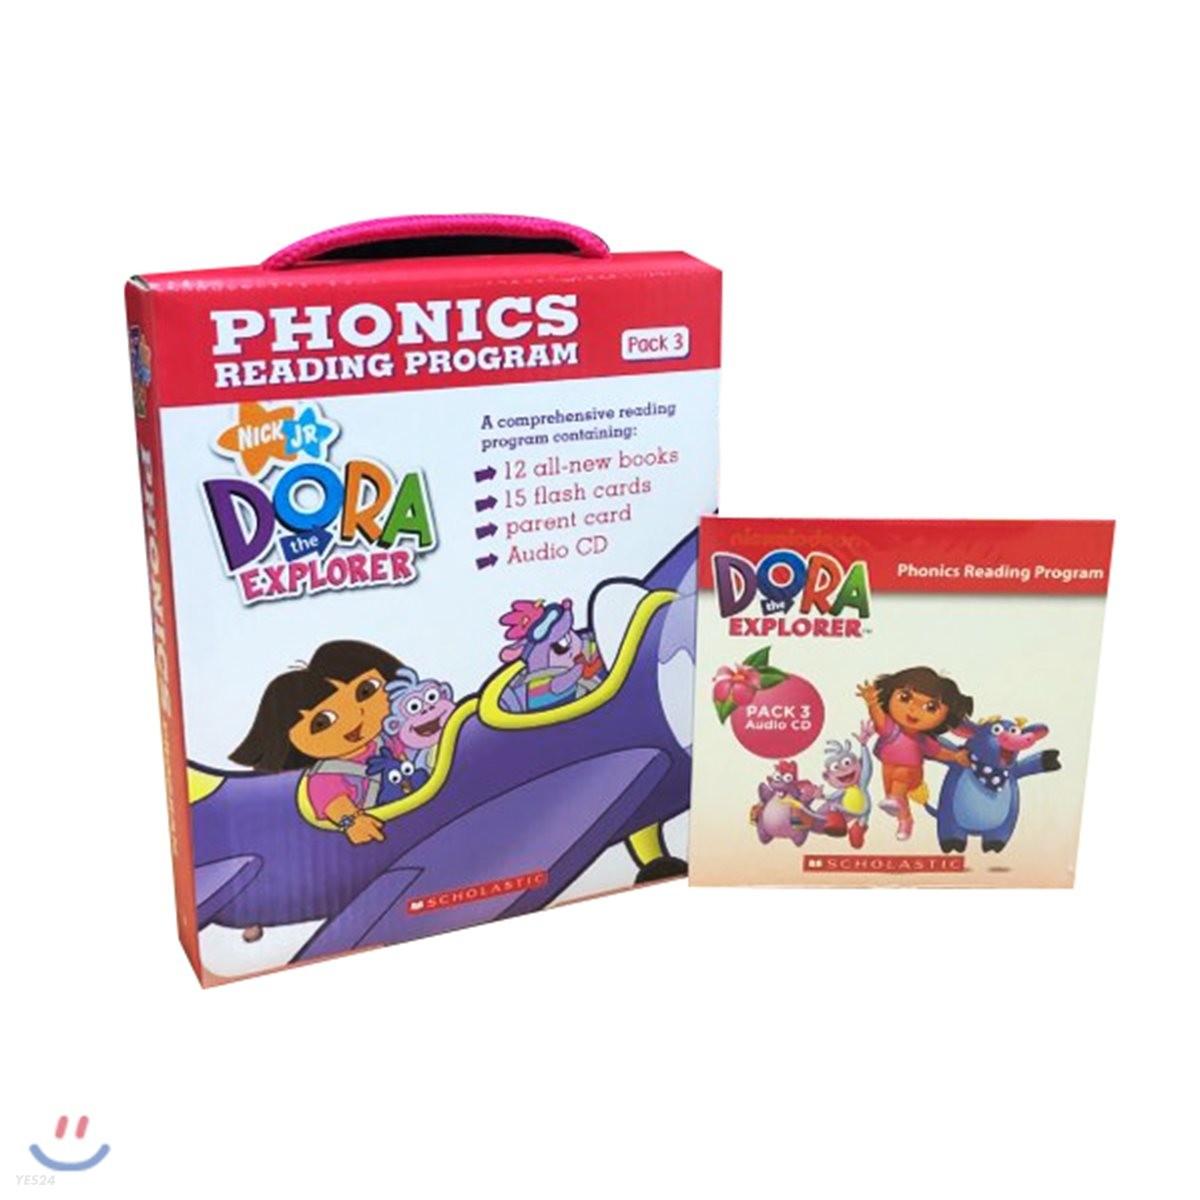 Dora The Explorer Phonics Fun Pack 3 with CD : 도라 파닉스 리더스 3